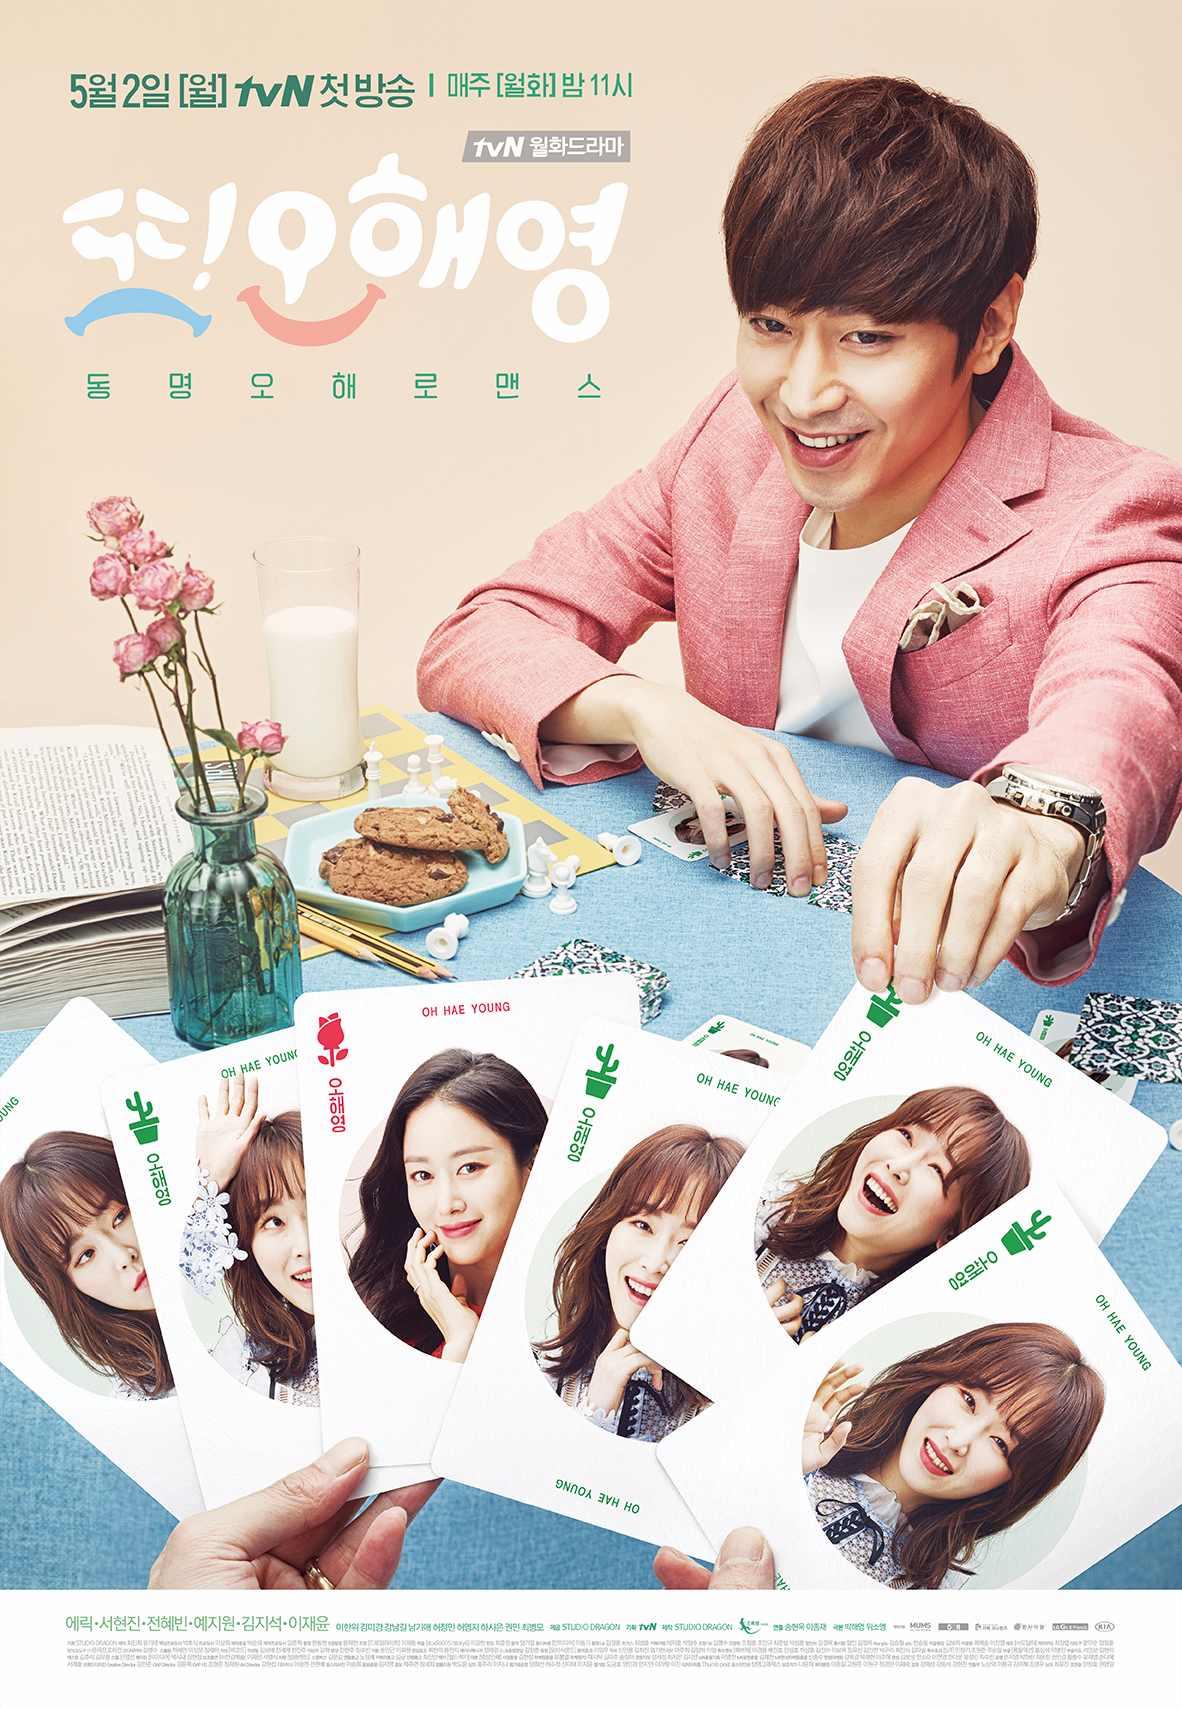 3位 tvN《又,吳海英》:267446分